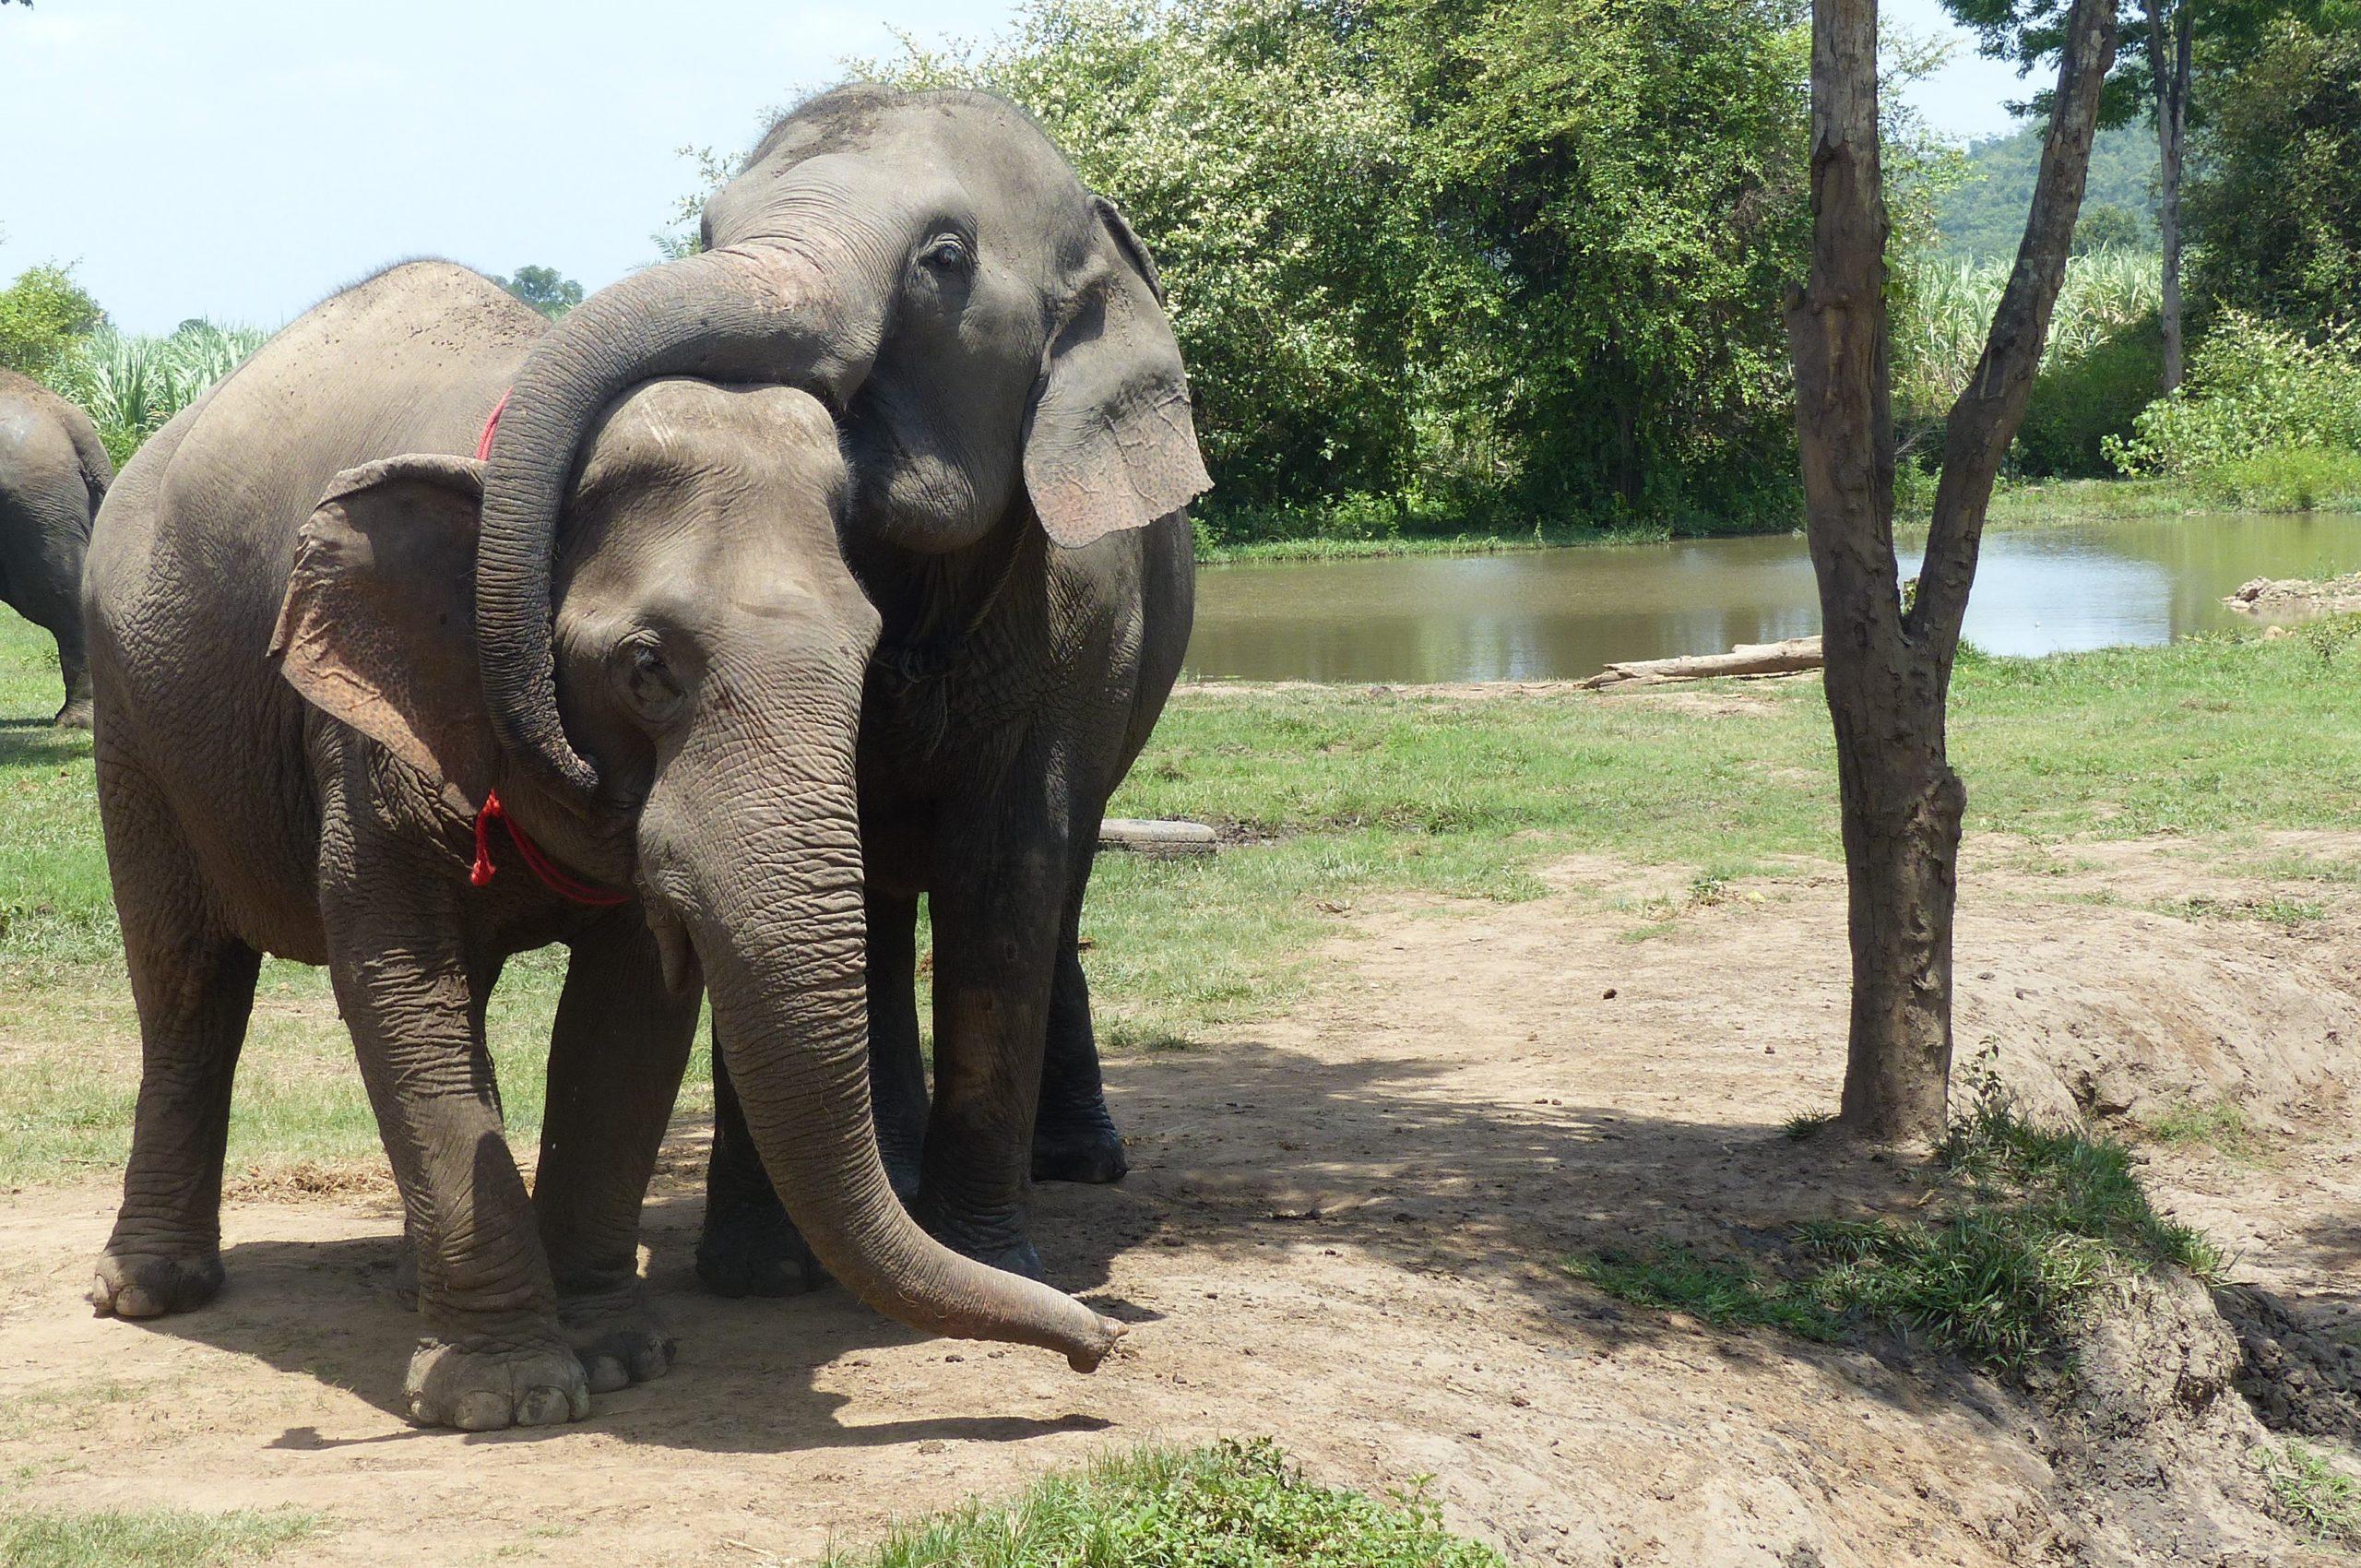 kanchanaburithailande_asie_elephants_jeu_trompes